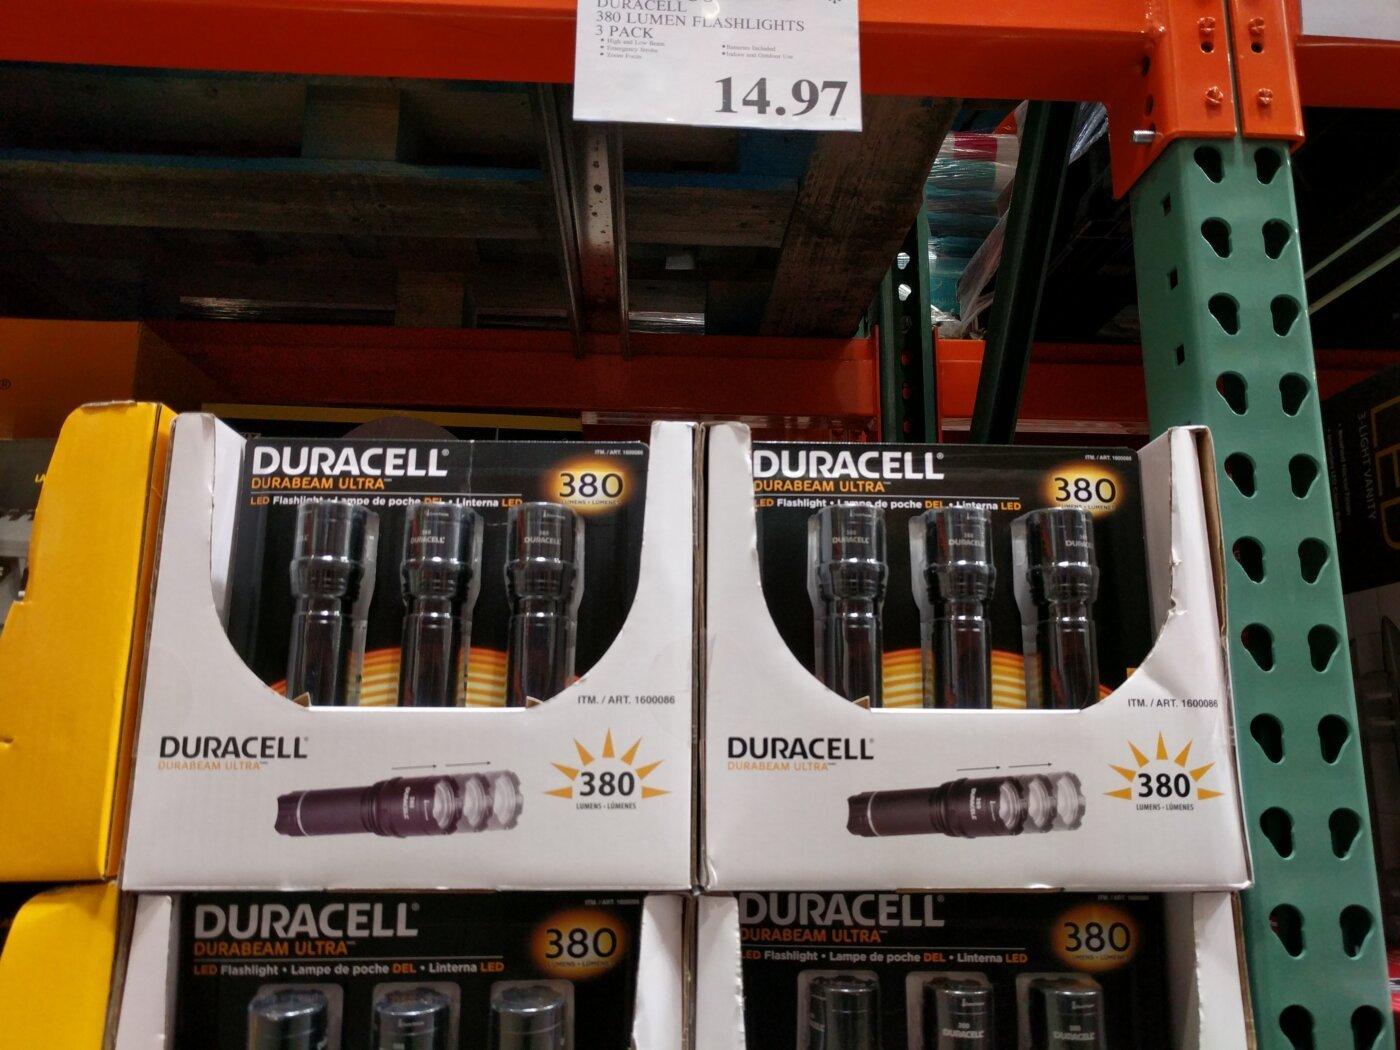 Lumen Duracell 3 Flashlights 380 Pack Led EHWD9I2